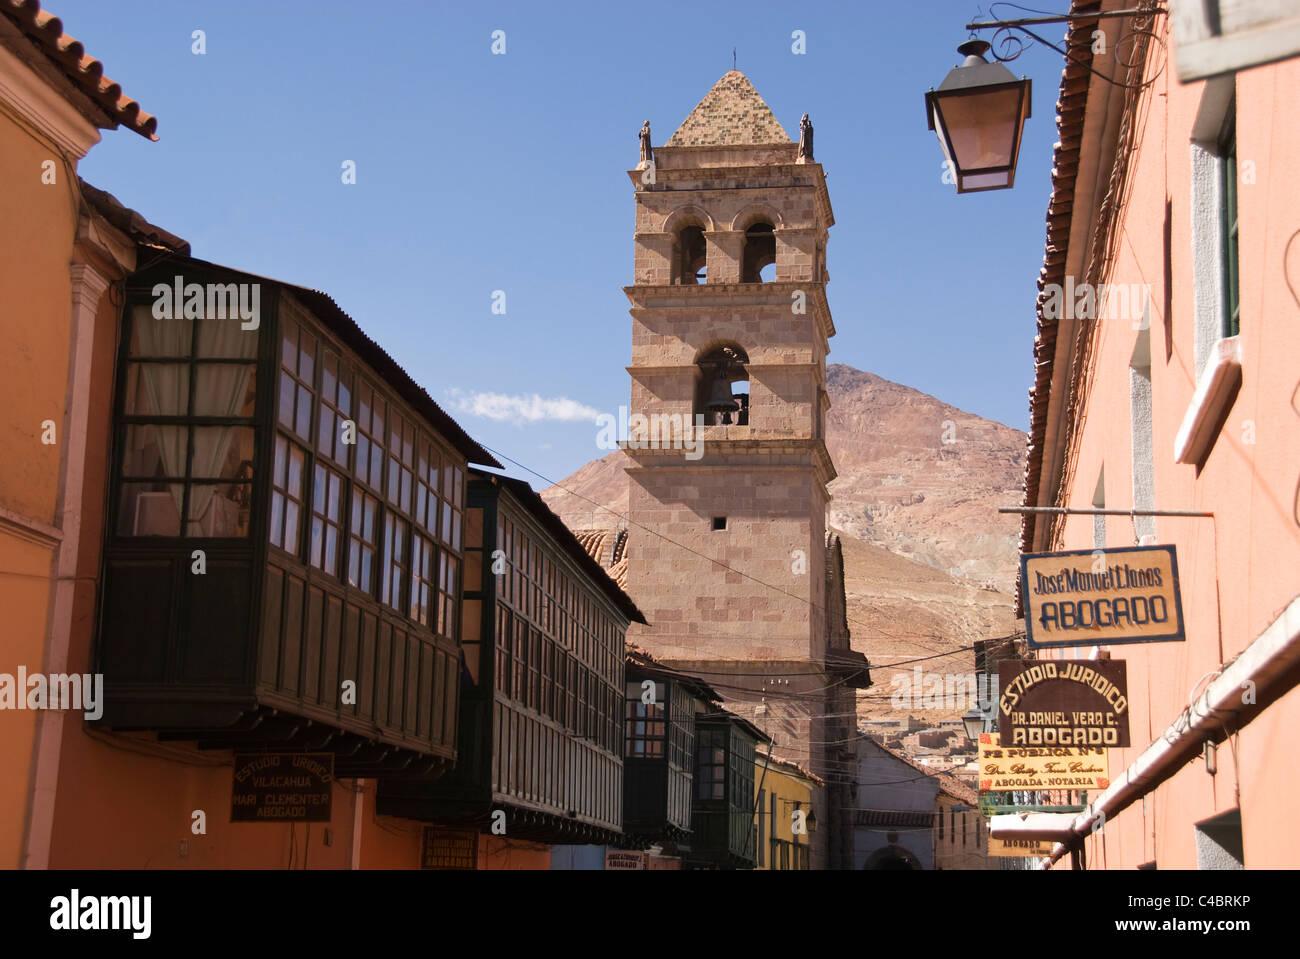 Potosi, Iglesia San Francisco church, tower with street scene - Stock Image